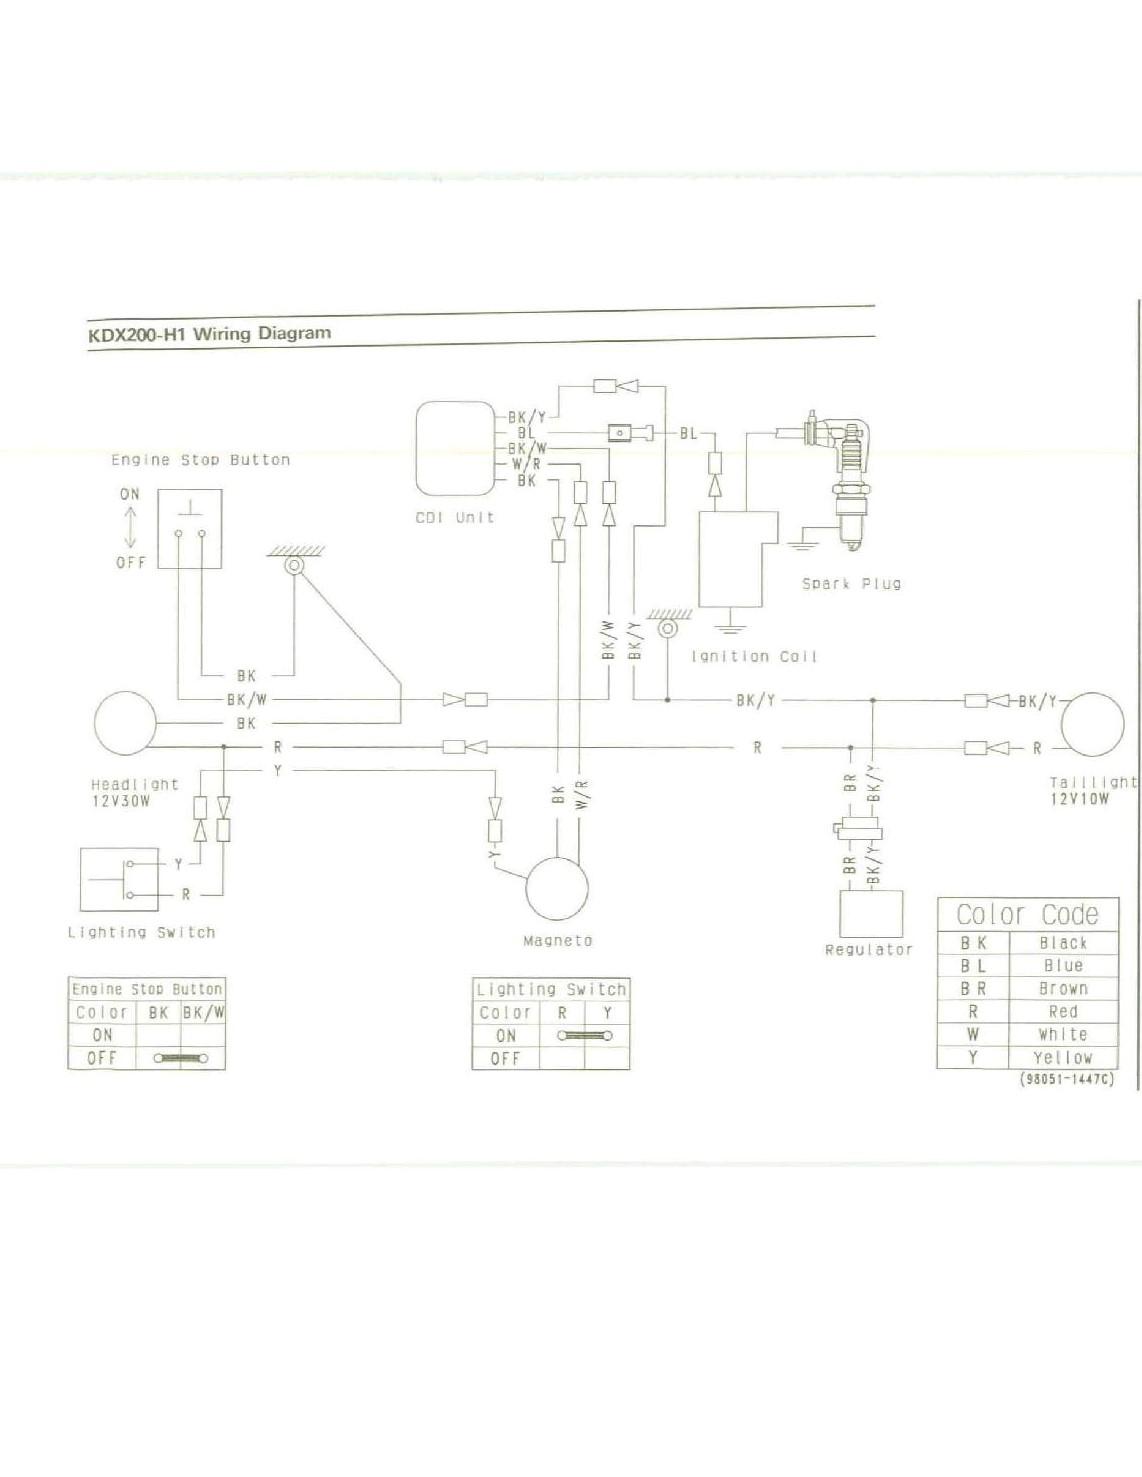 hight resolution of kdx 200 wiring diagram wiring diagram toolboxkdx 200 wiring diagram diagram data schema kawasaki kdx 200